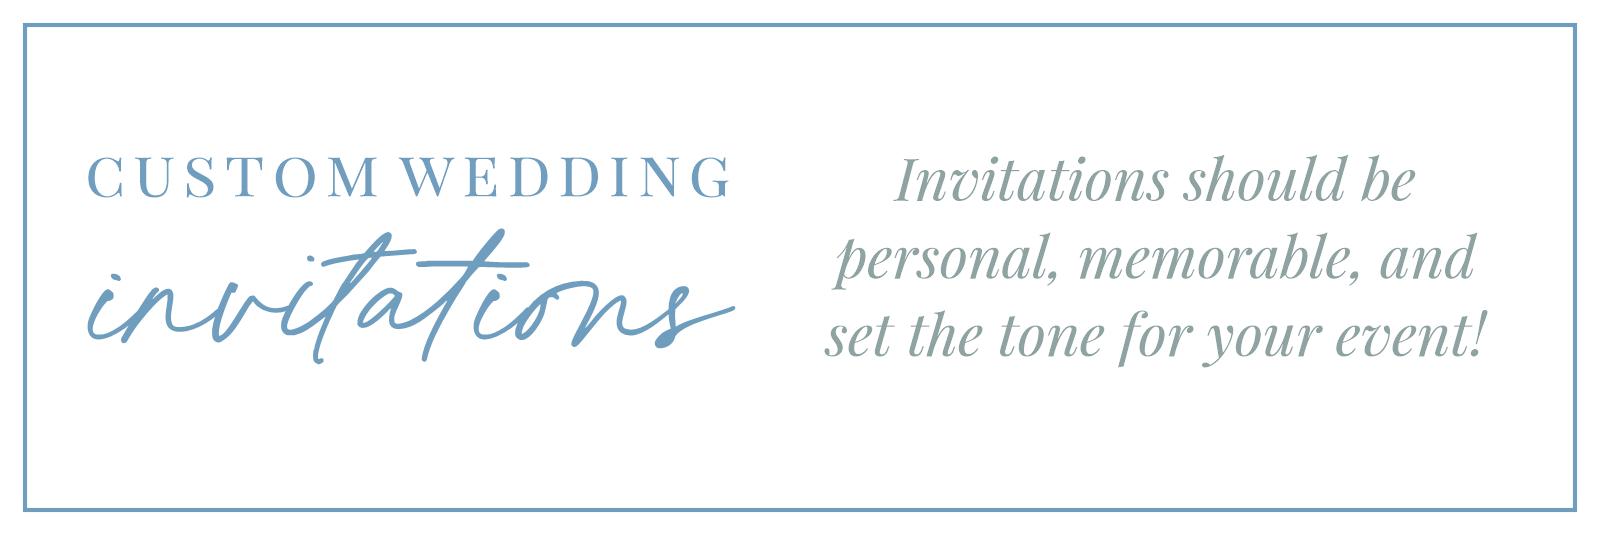 Custom Wedding Invitations Feature